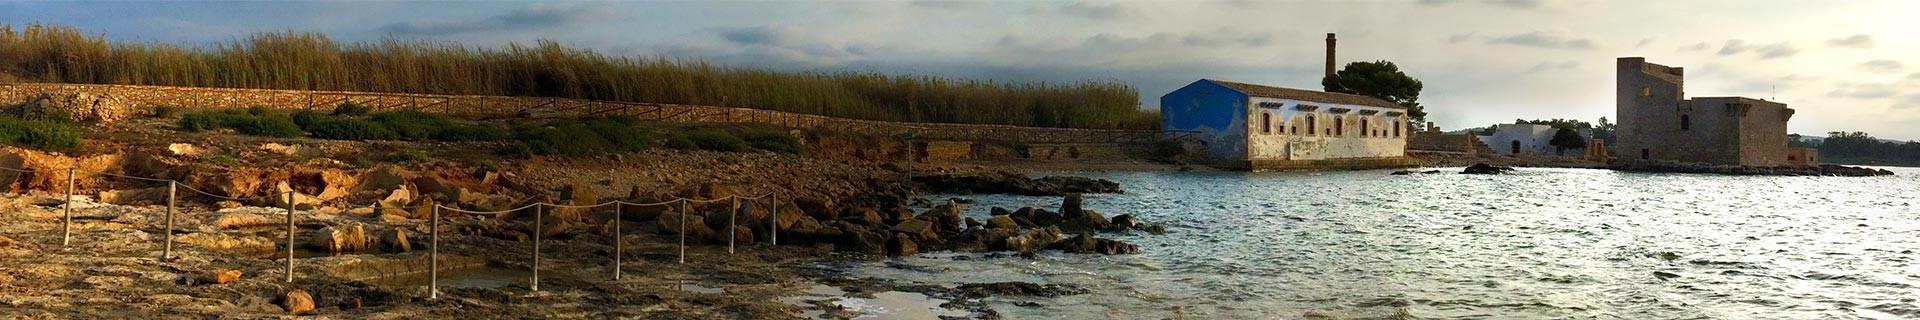 Foto riserva naturale Vendicari